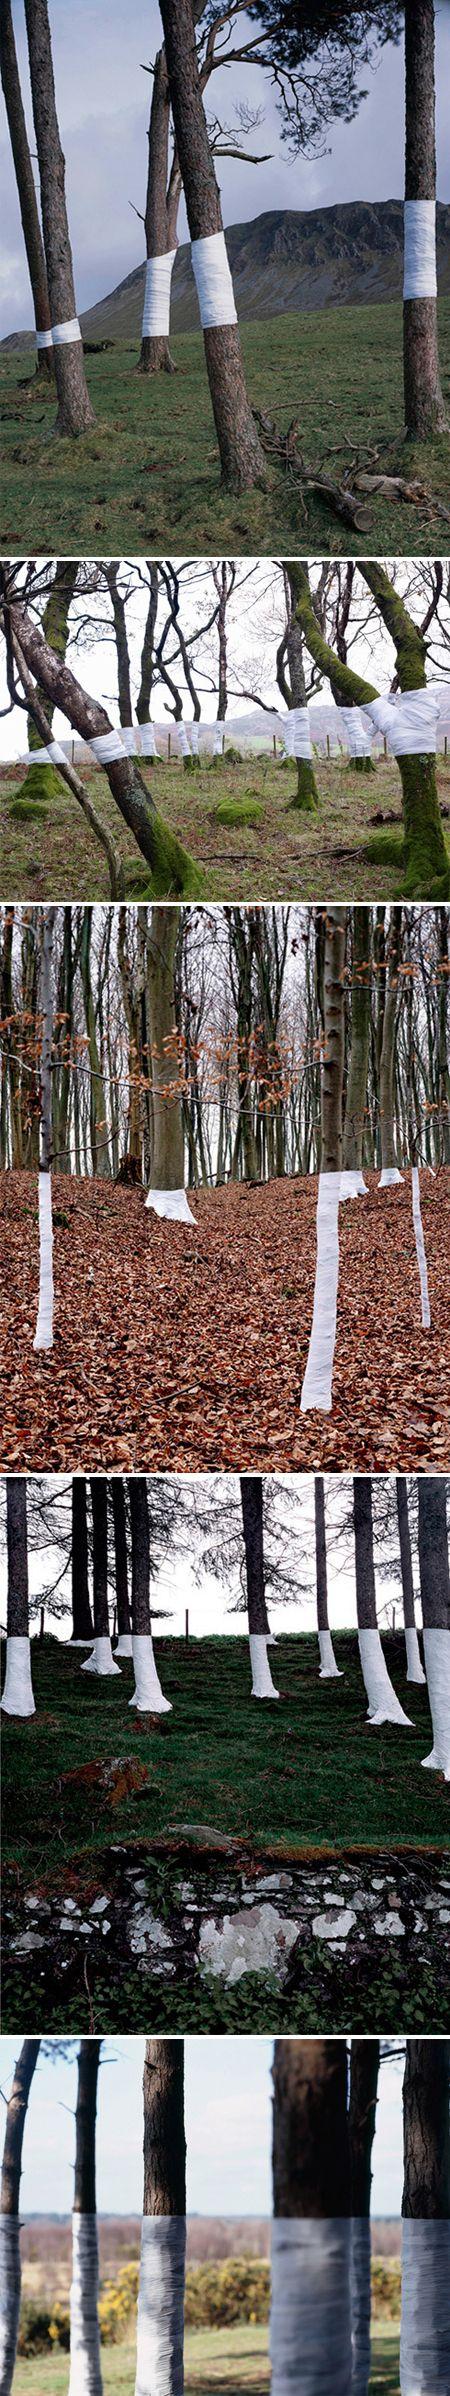 zander olsen - trees, white wrapping, and the horizon <3